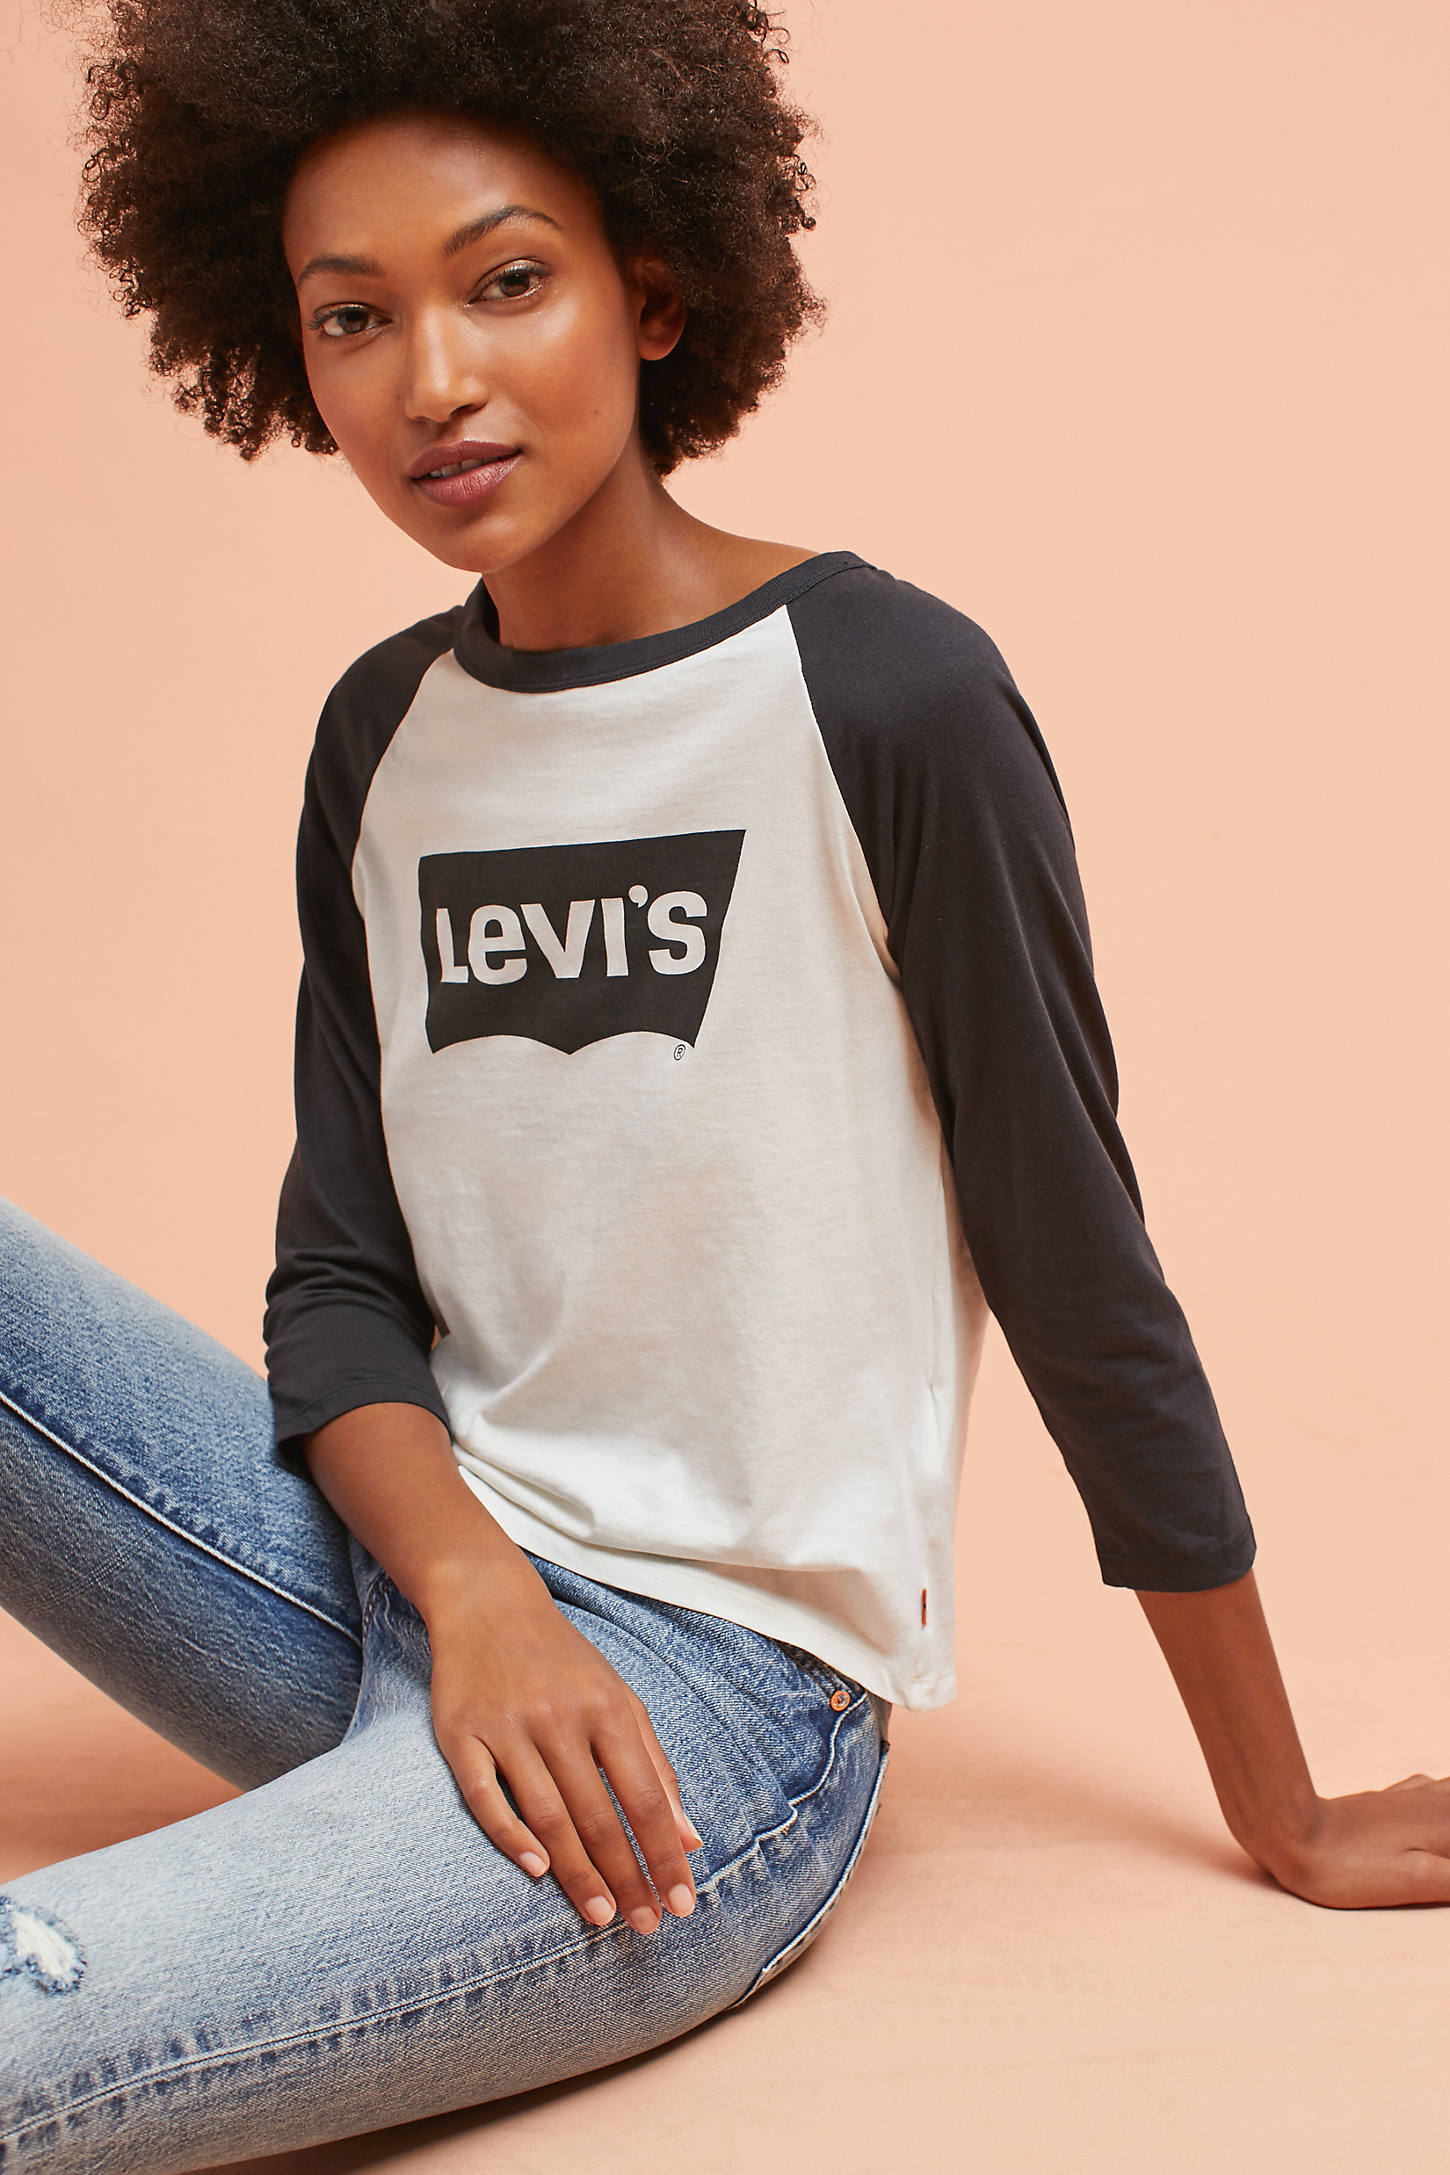 Levi's Raglan Logo Tee